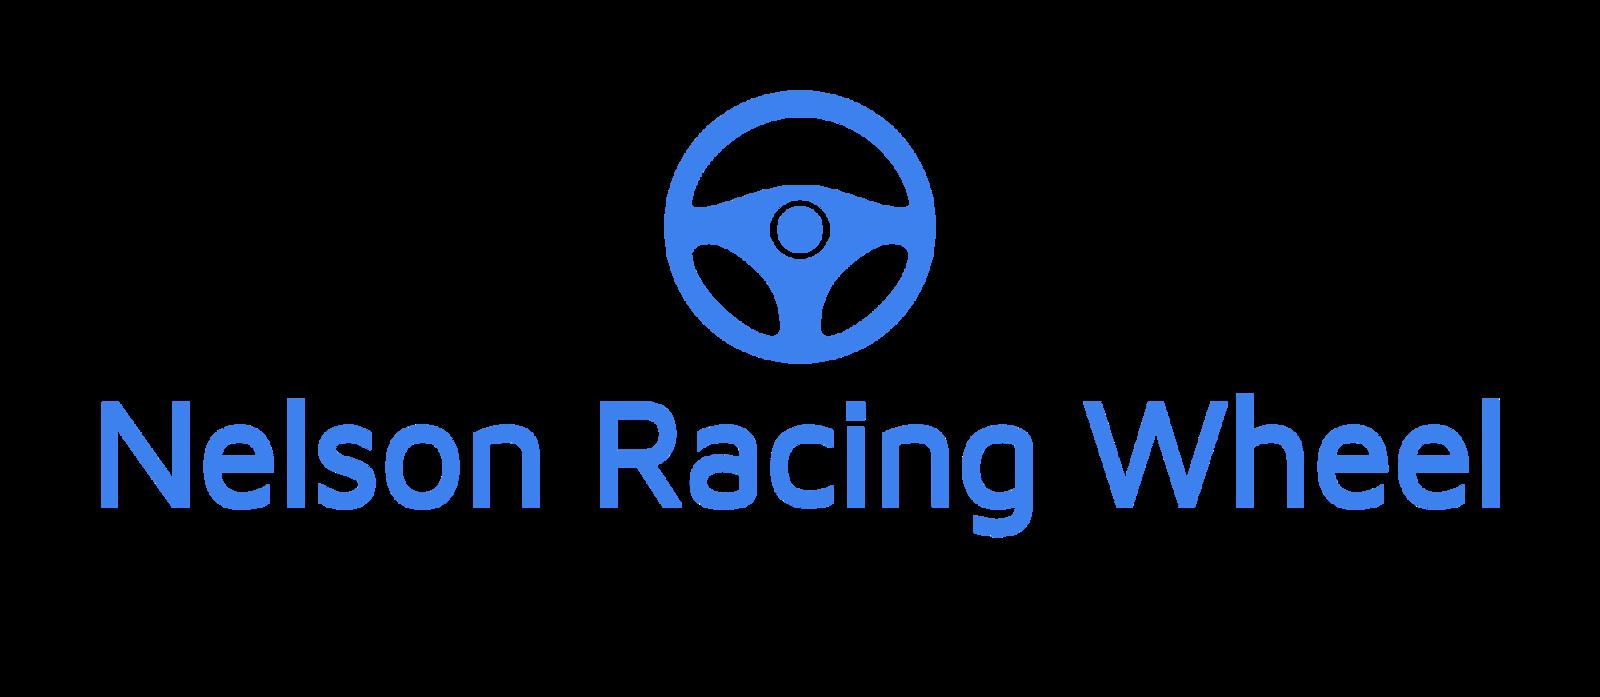 Nelson Racing Wheel-logo.png